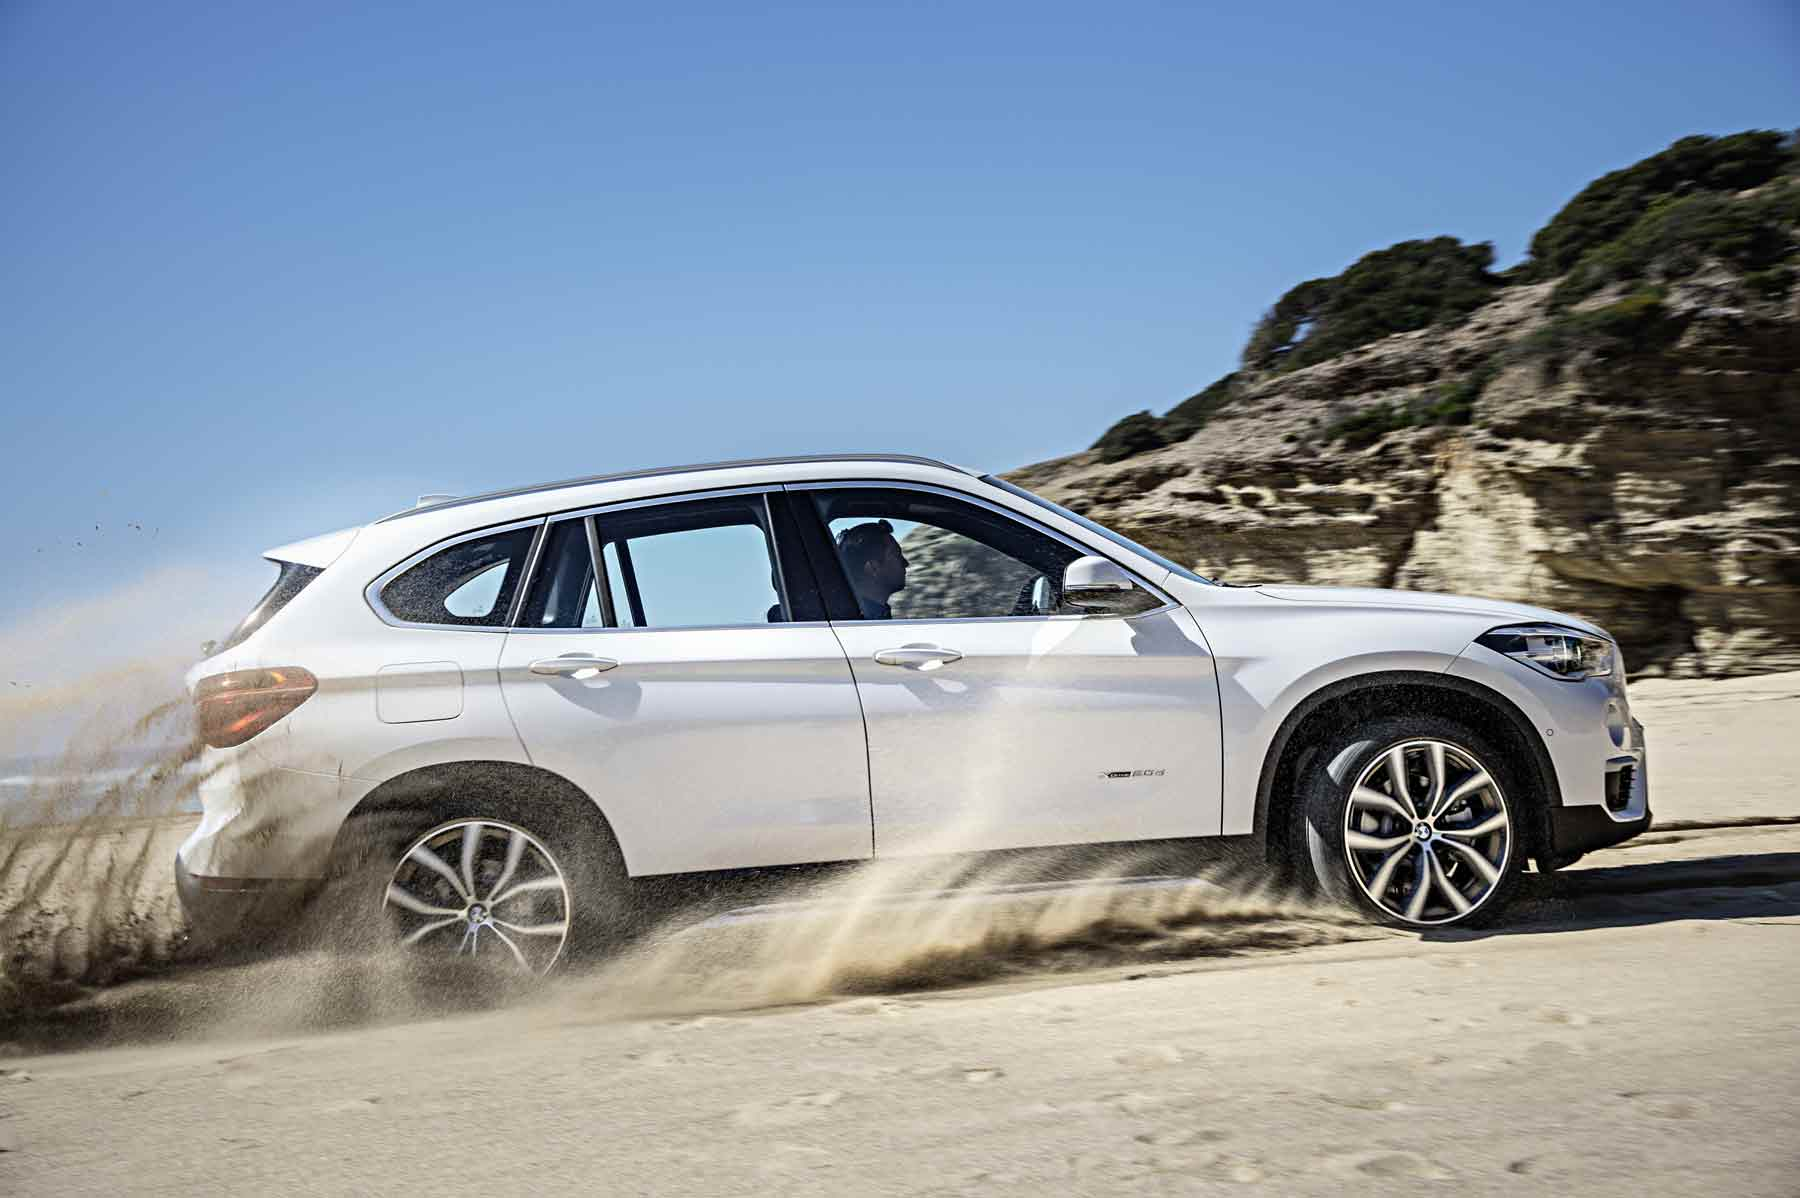 BMW-X1-Offroad